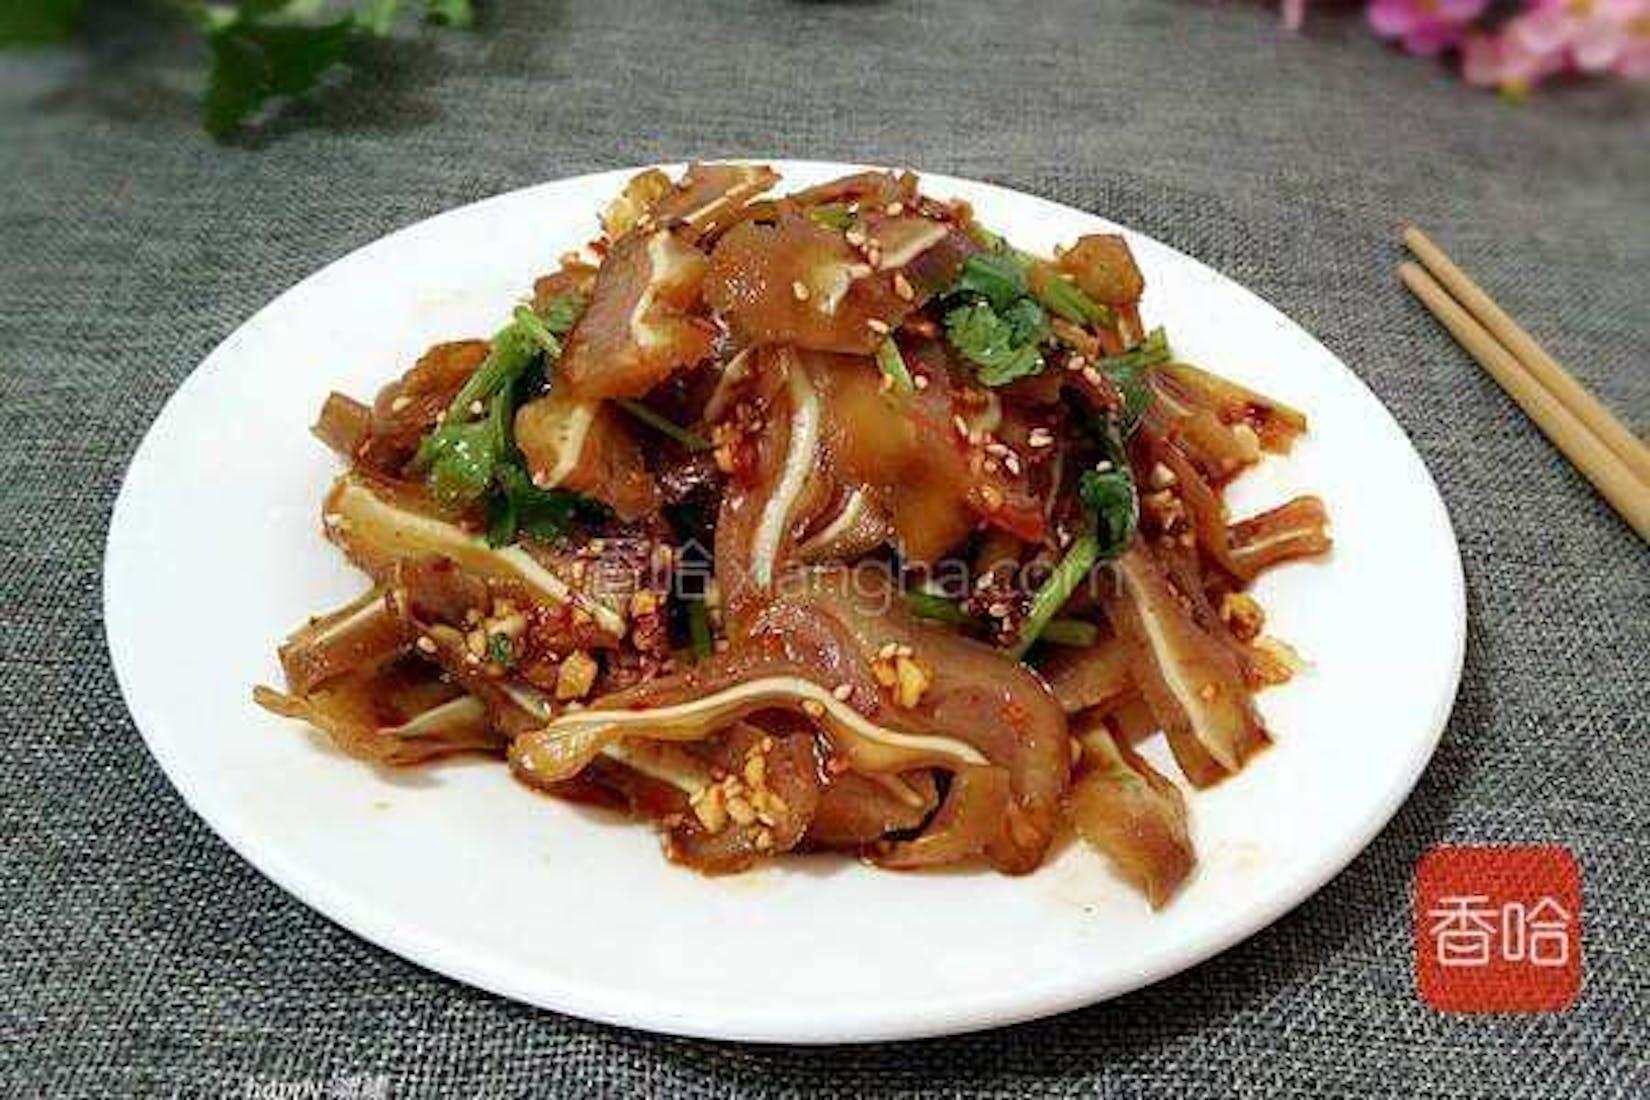 China Town Chinese Restaurant at 20 Street   yathar